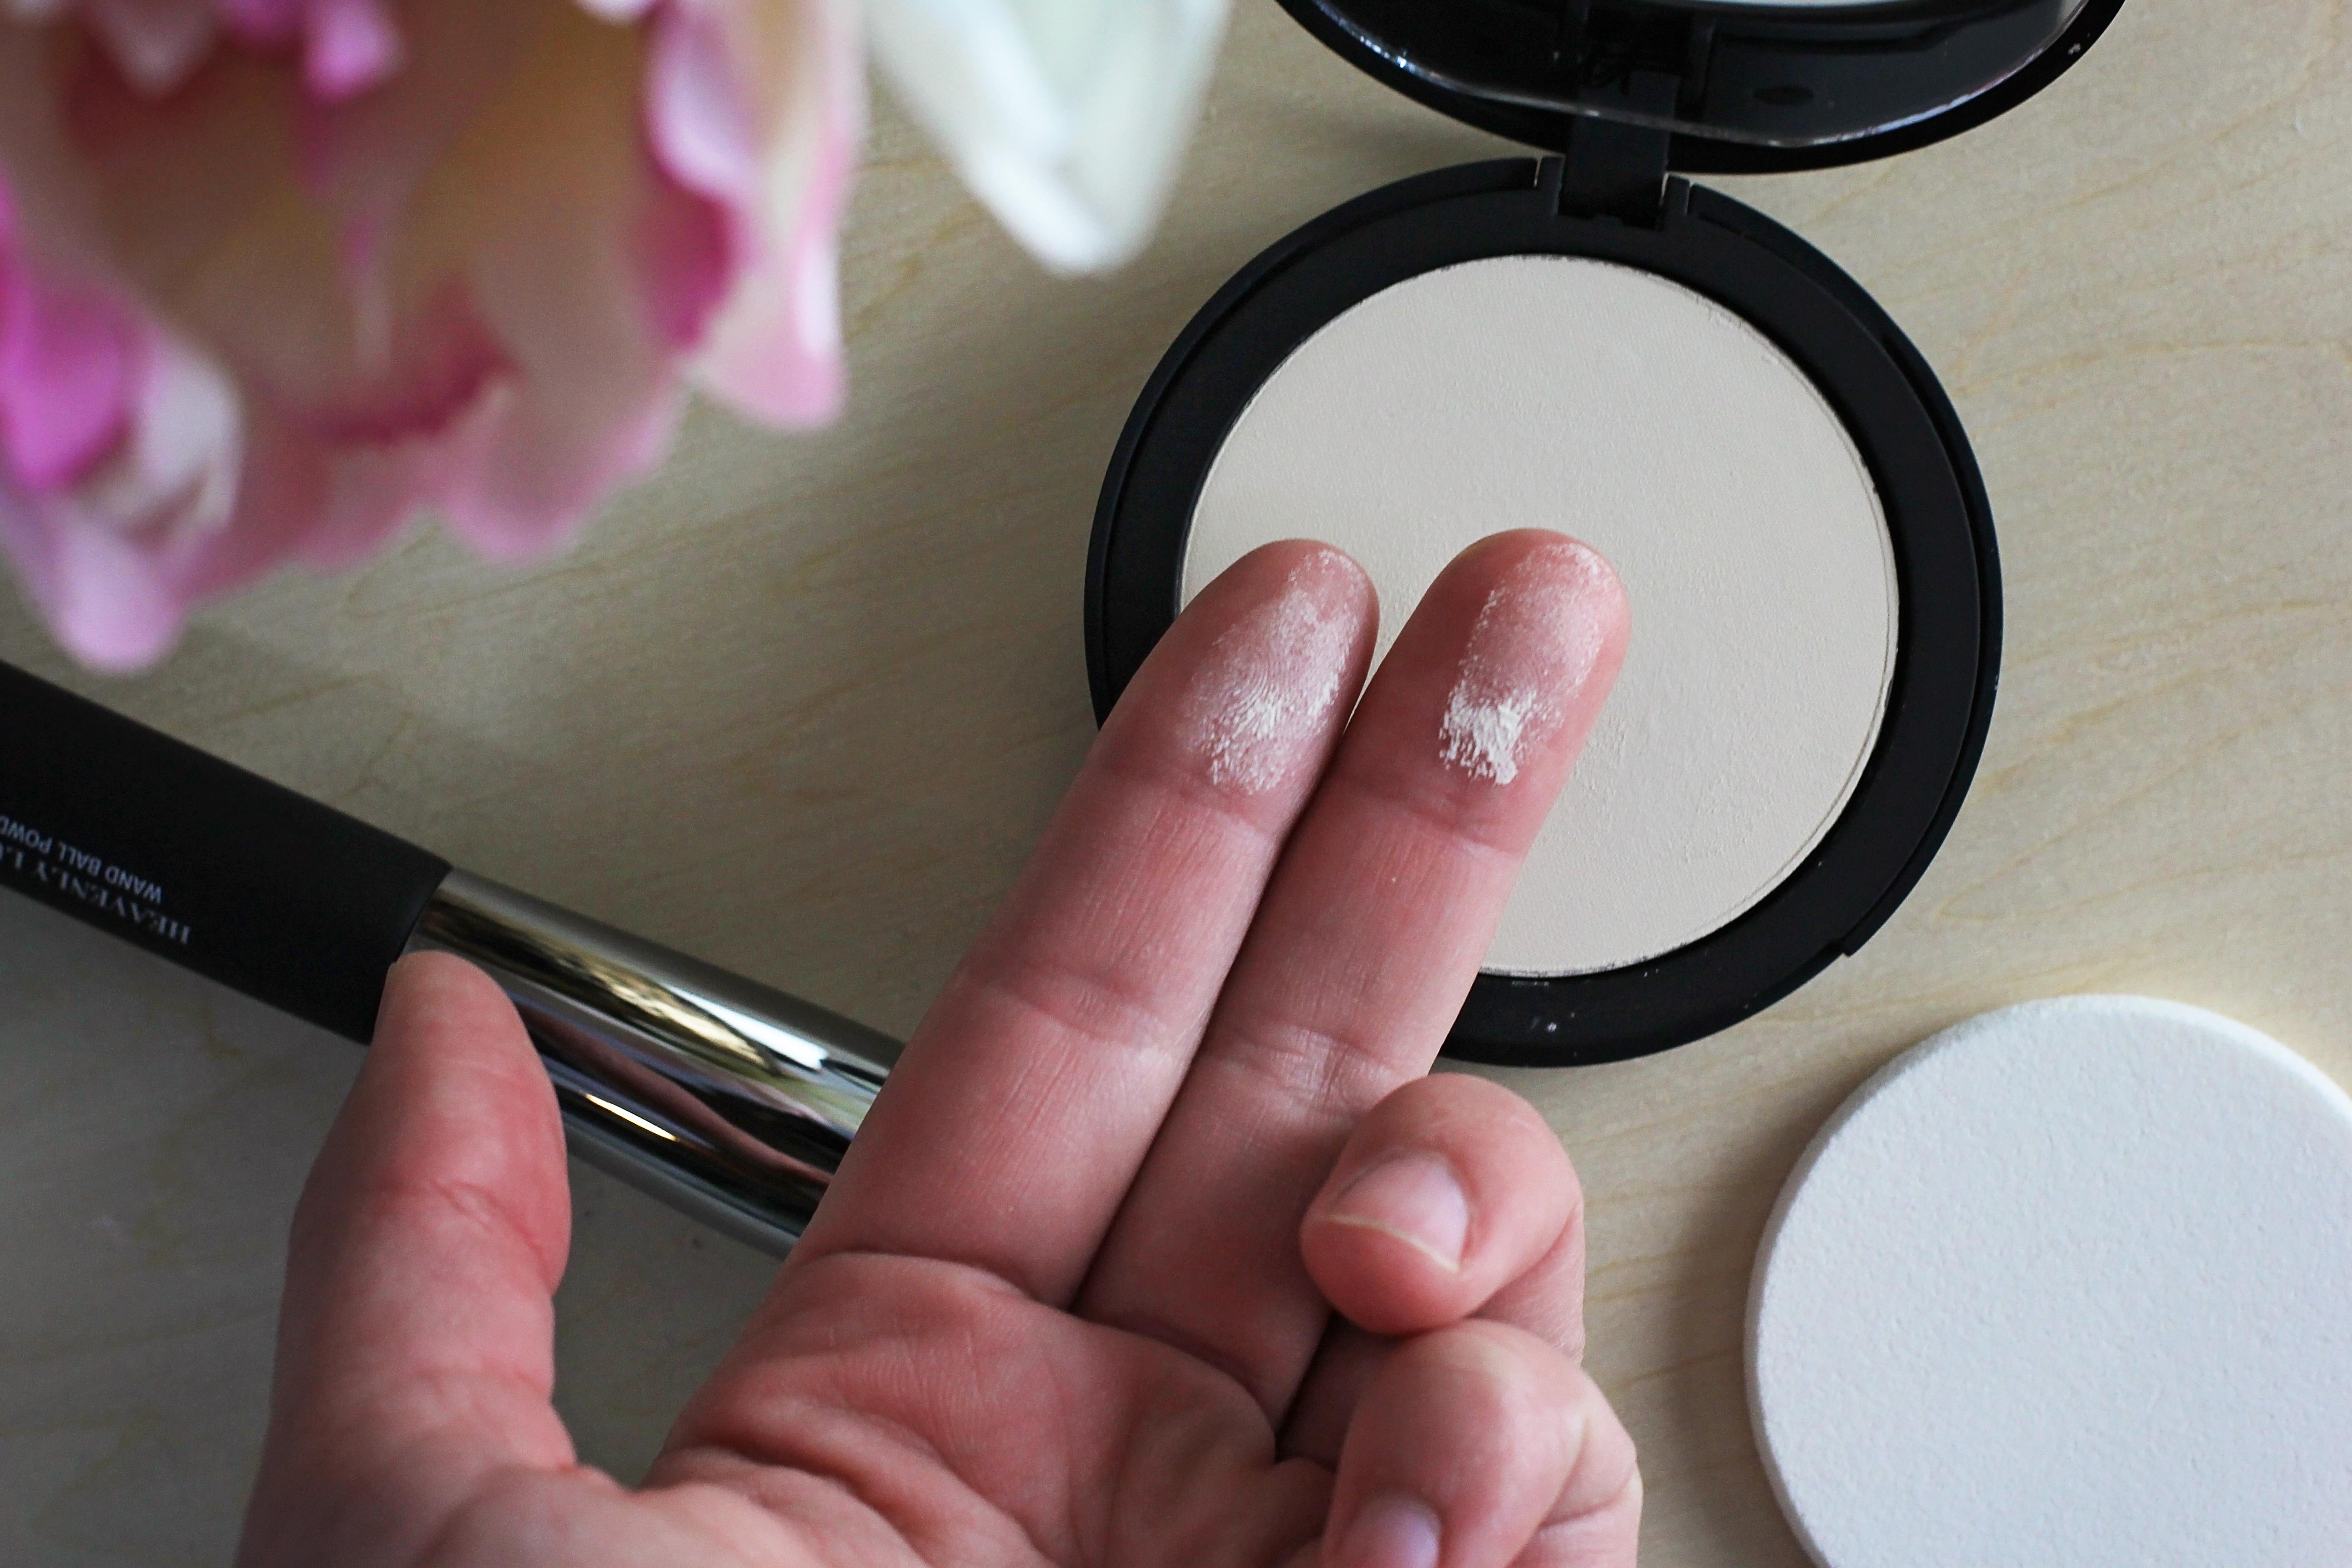 Bye Bye Pores Pressed Setting Powder by IT Cosmetics #8